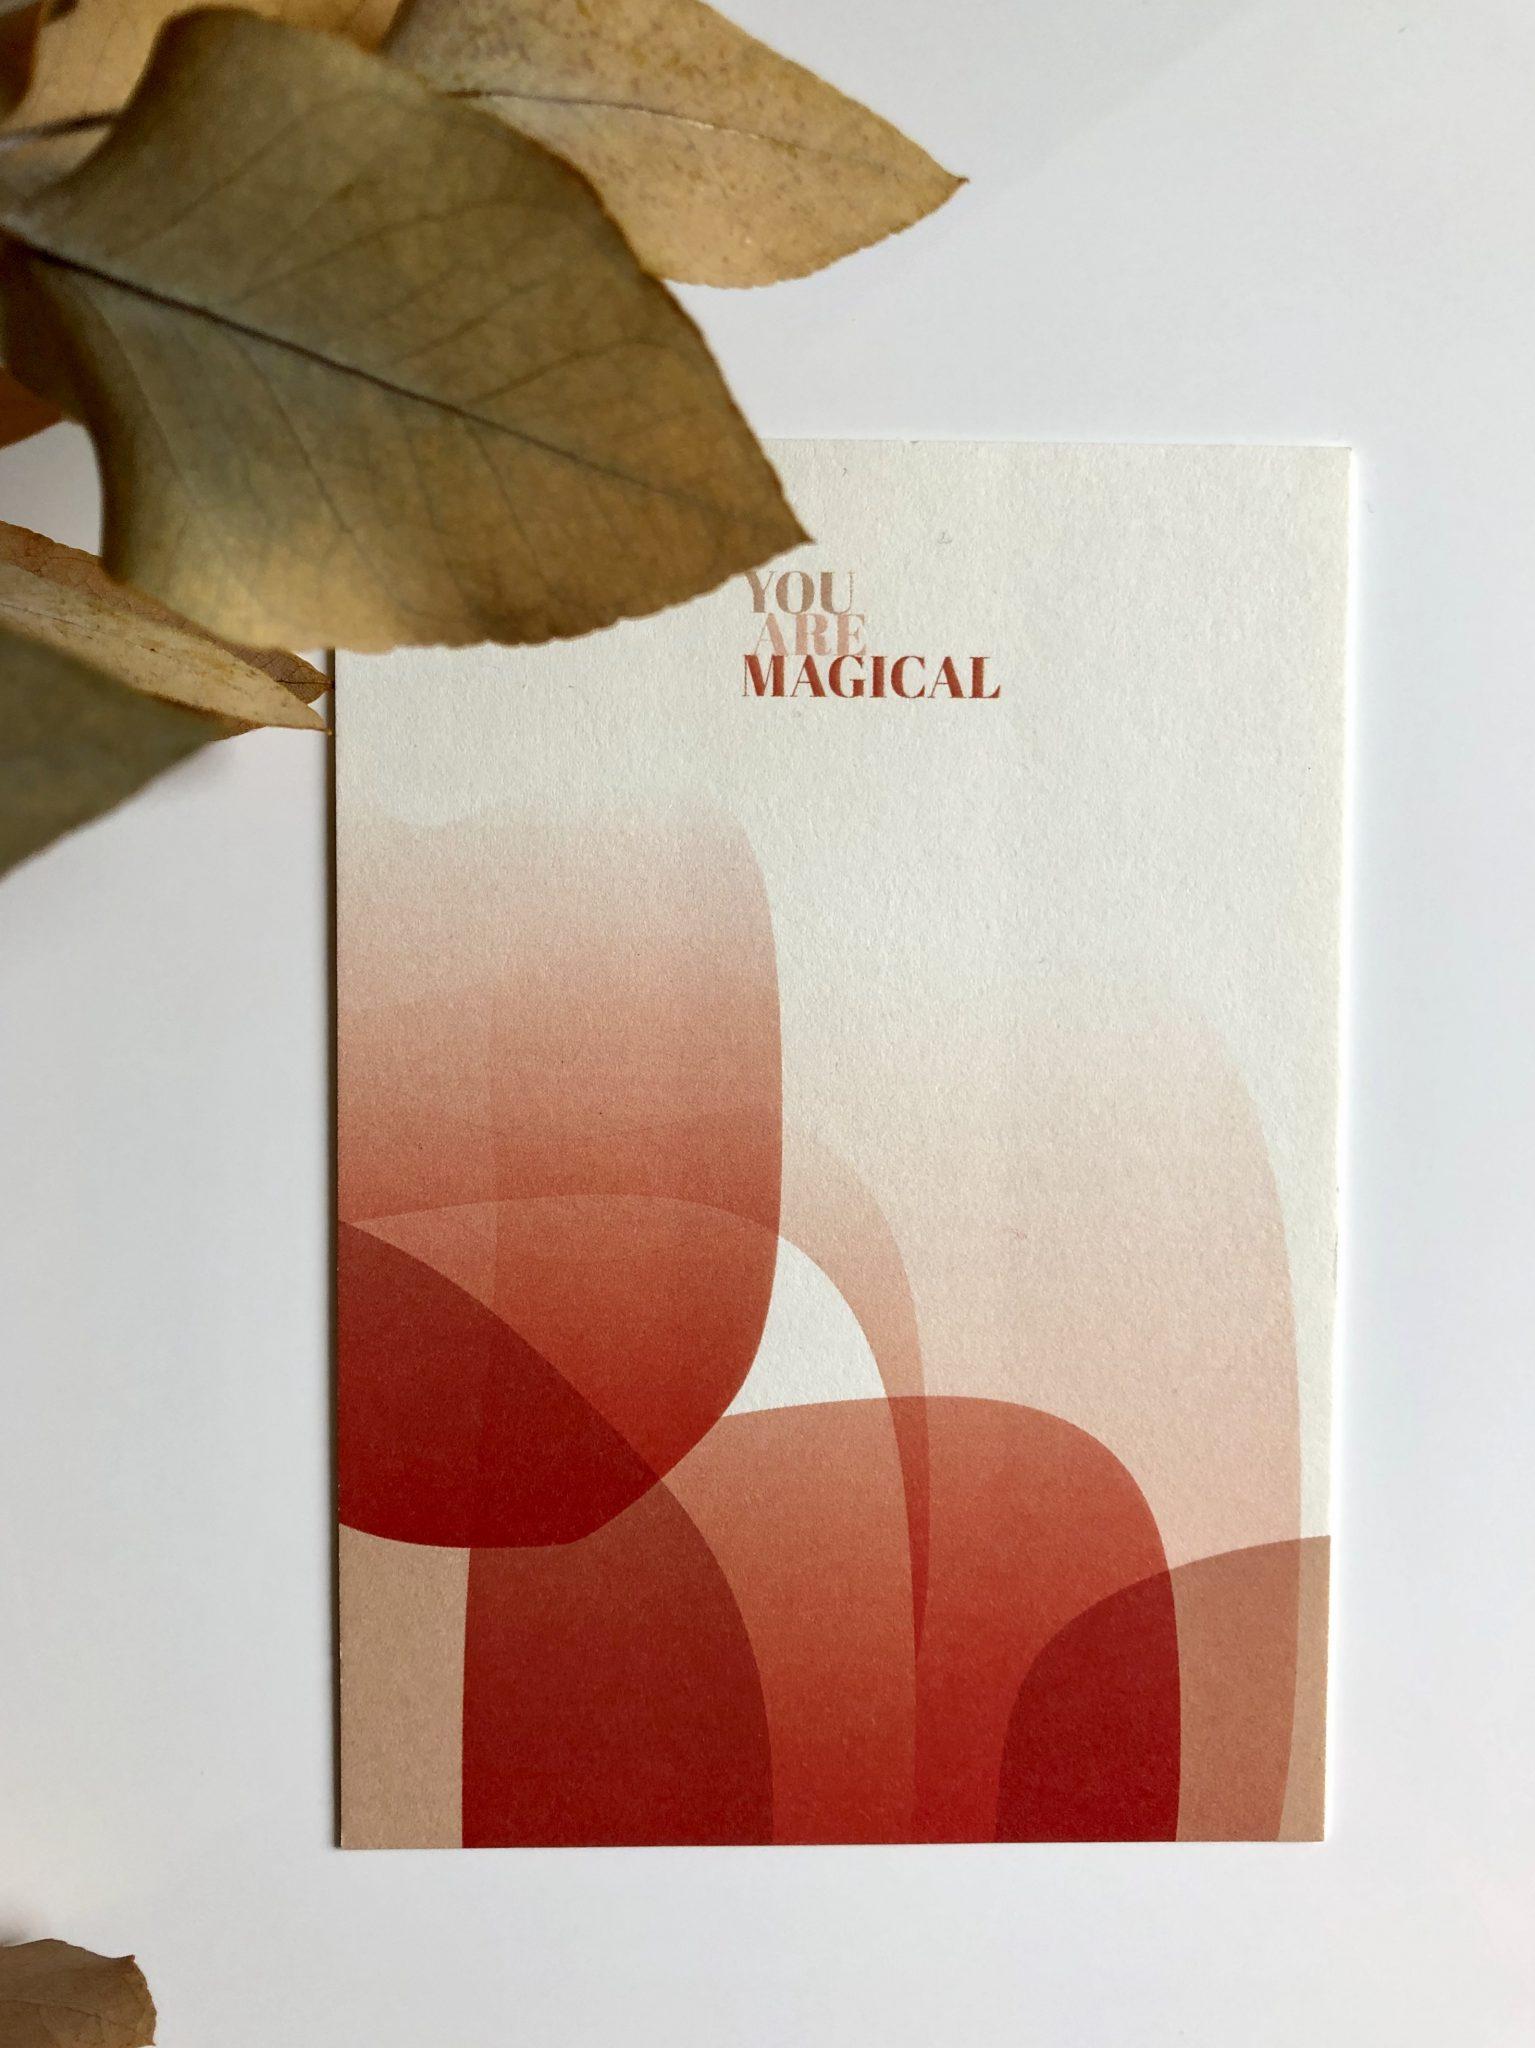 Grußkarte You Are Magical